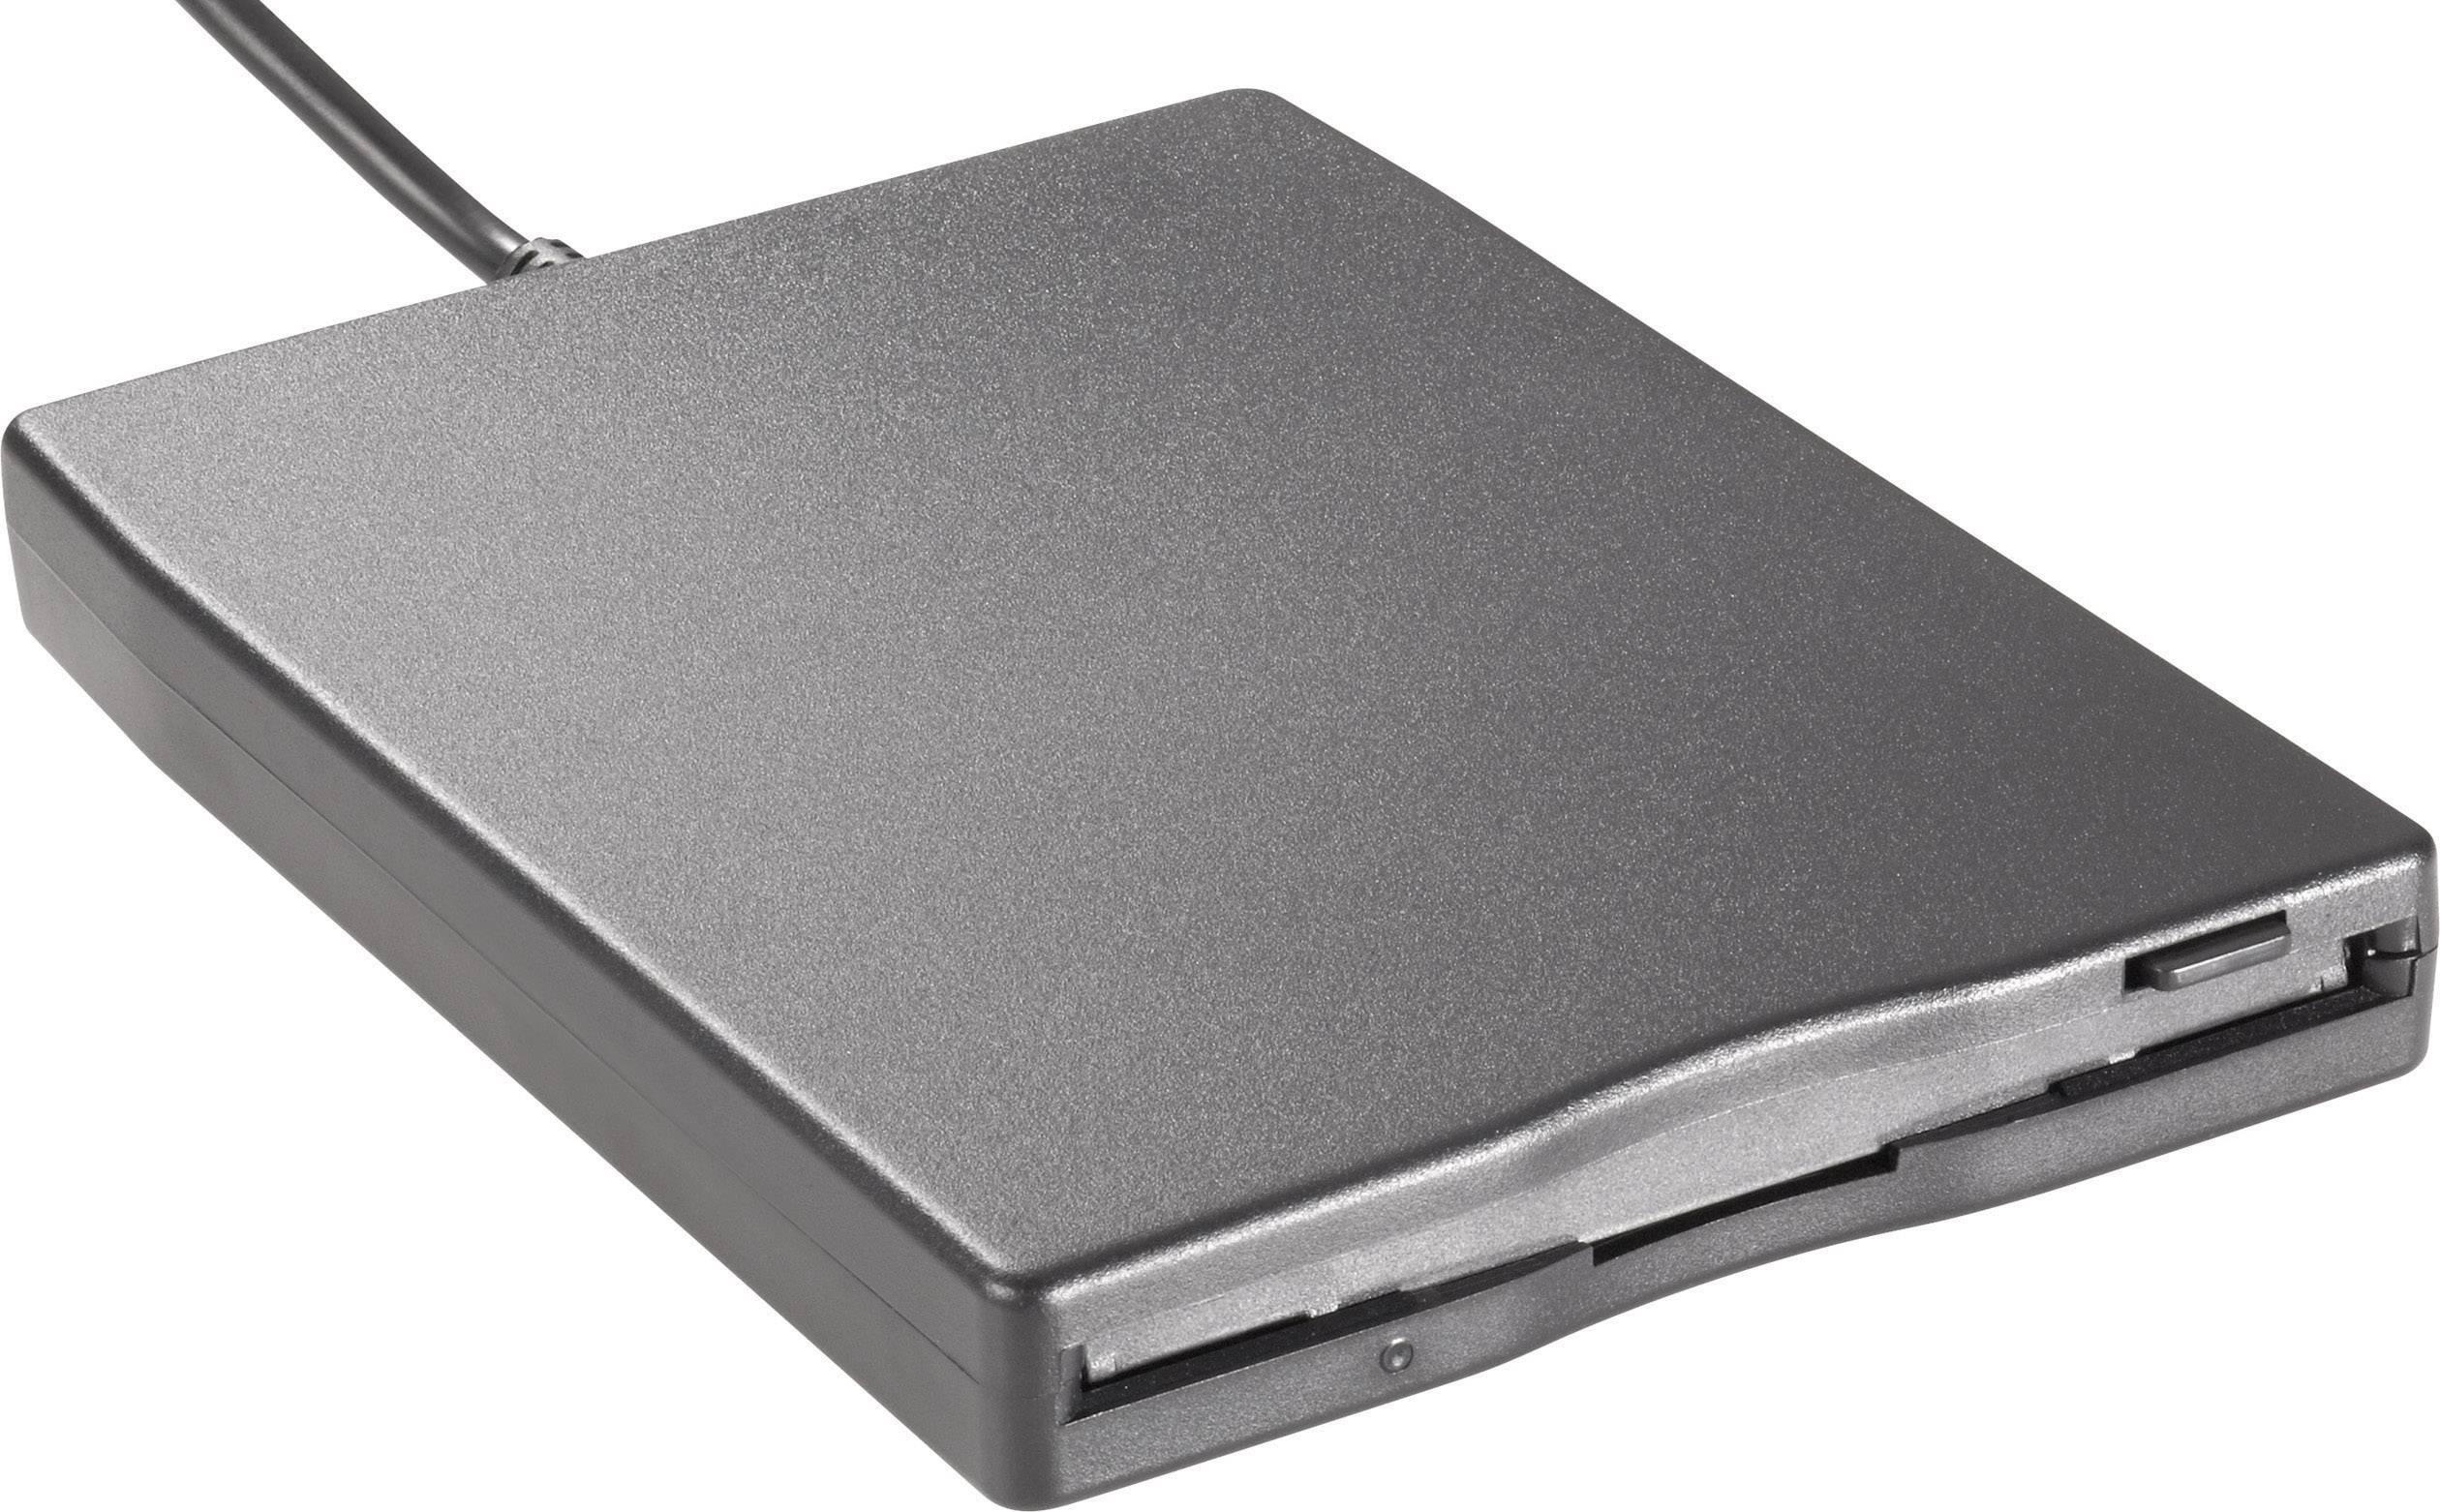 Disketová mechanika Basetech GEN-144, USB 2.0, 104 x 19 x 143 mm